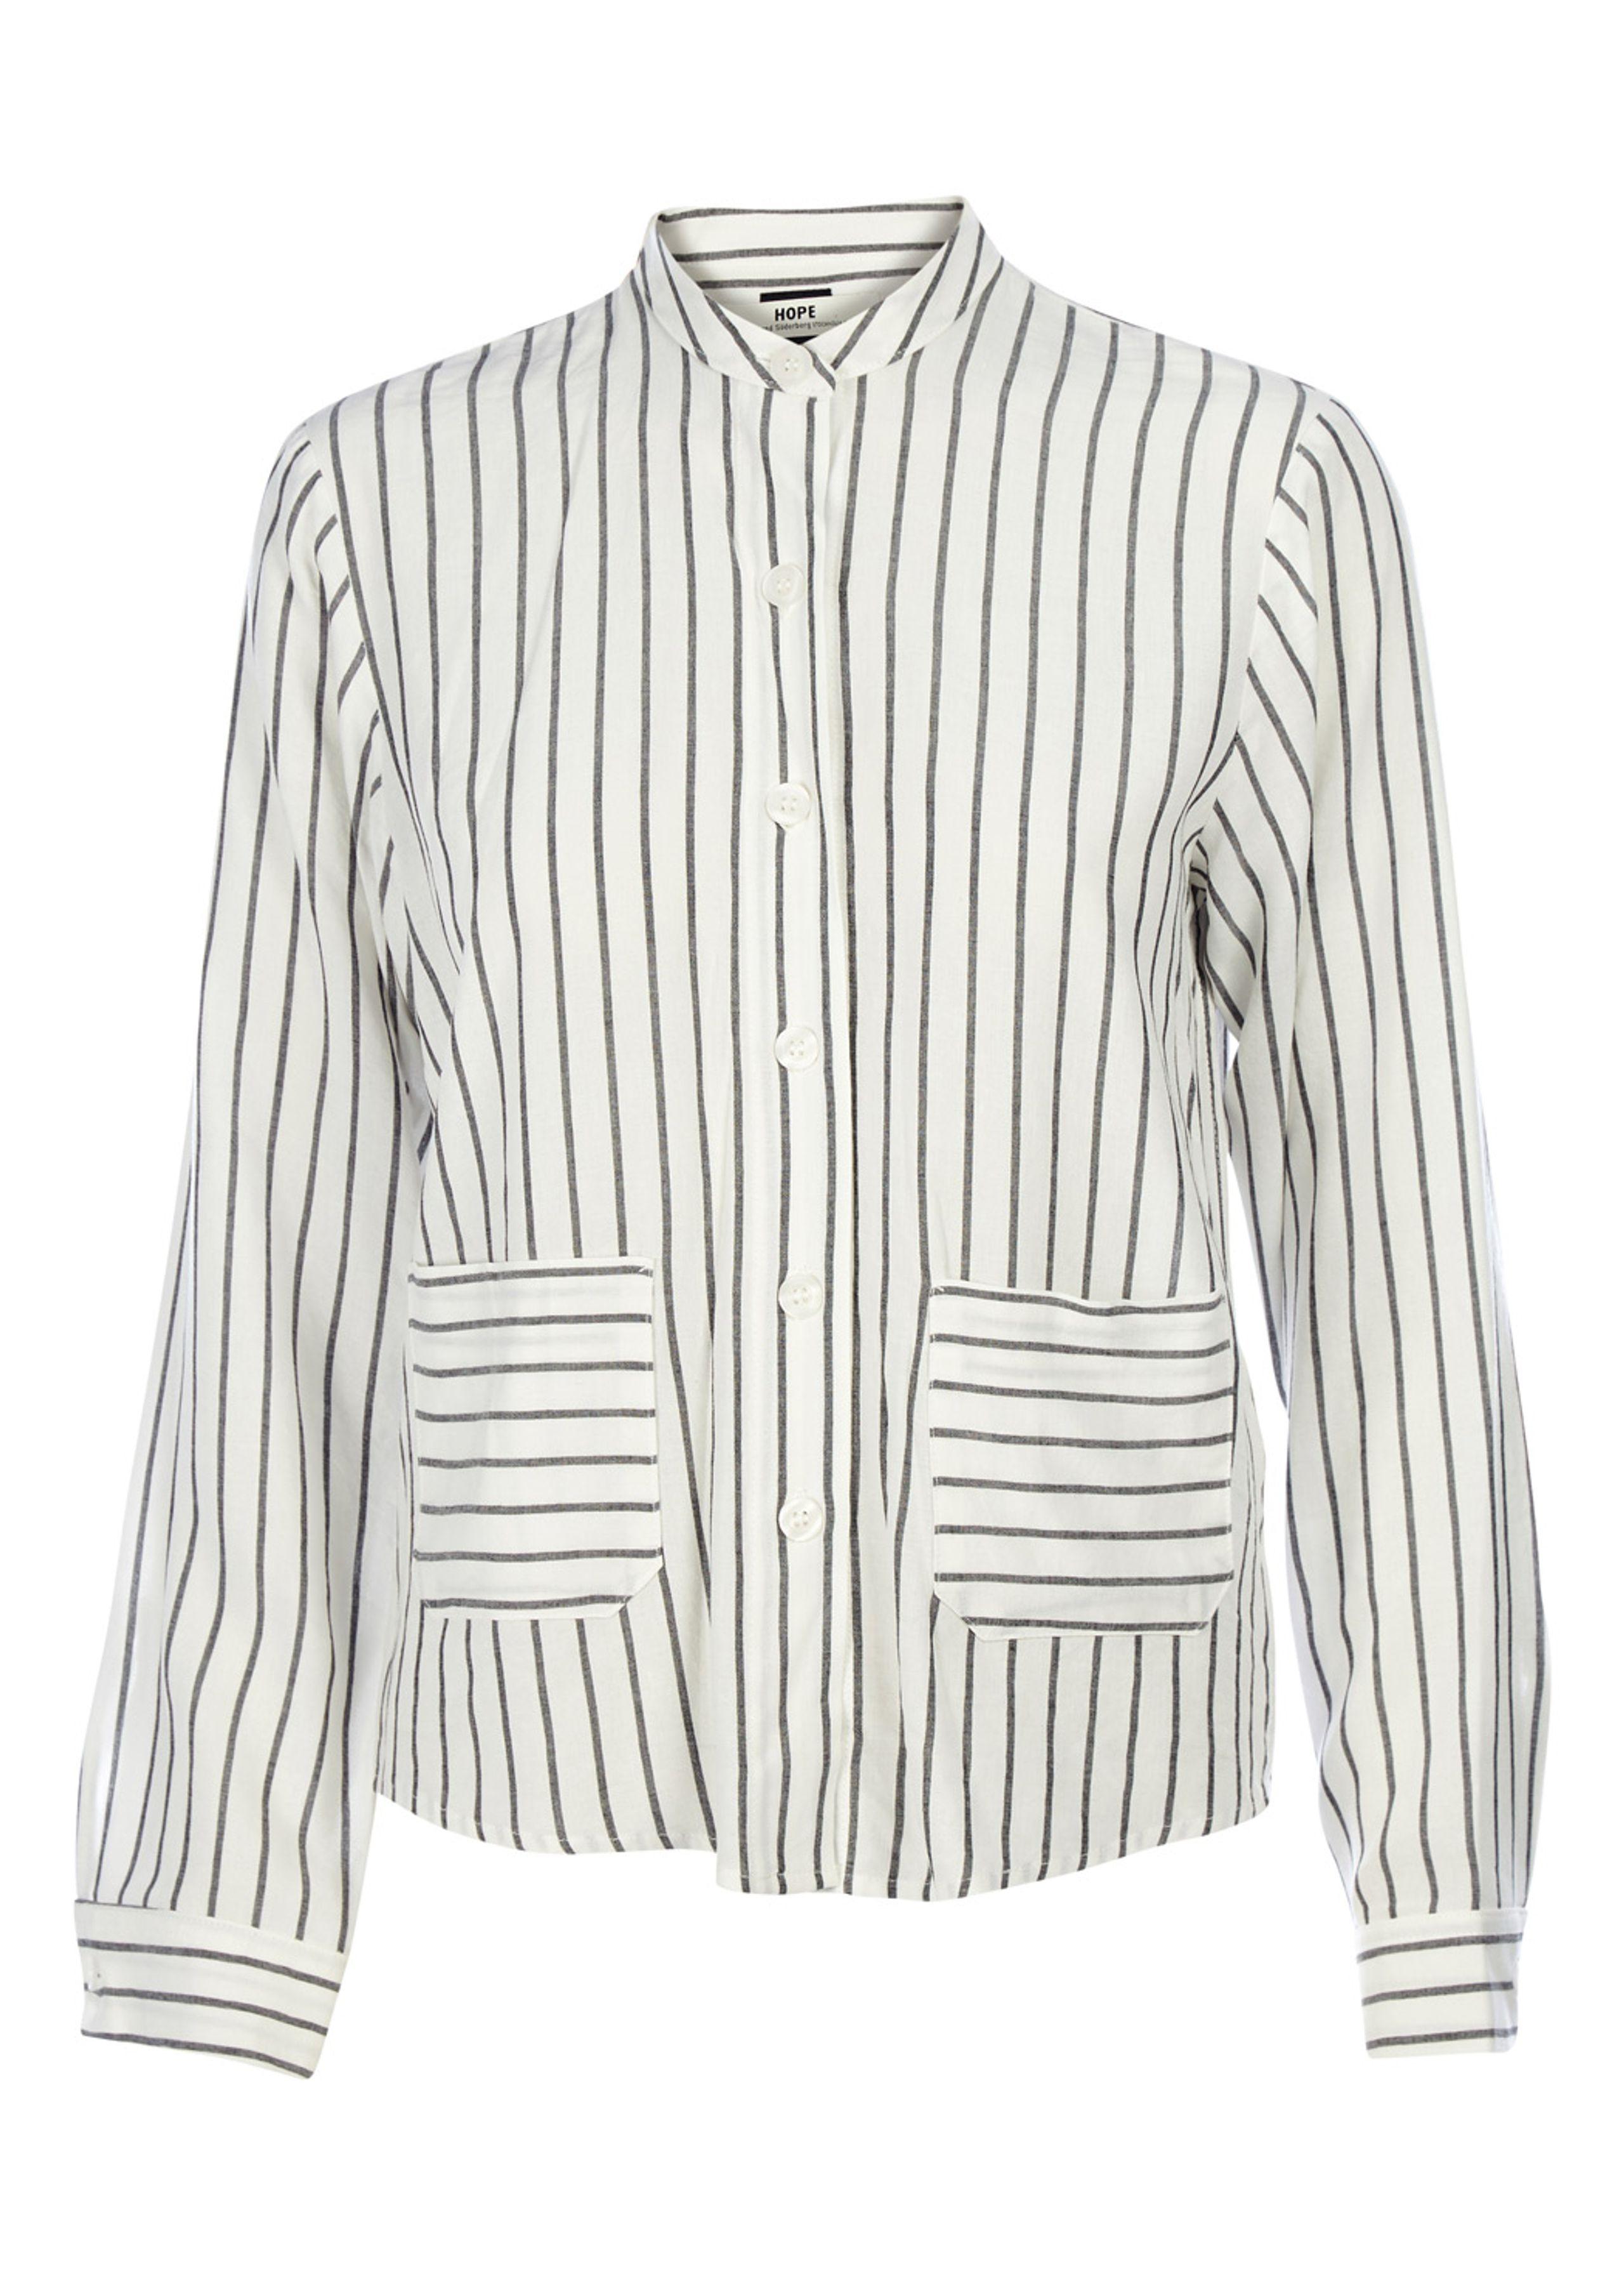 Image of   June Stripe Shirt